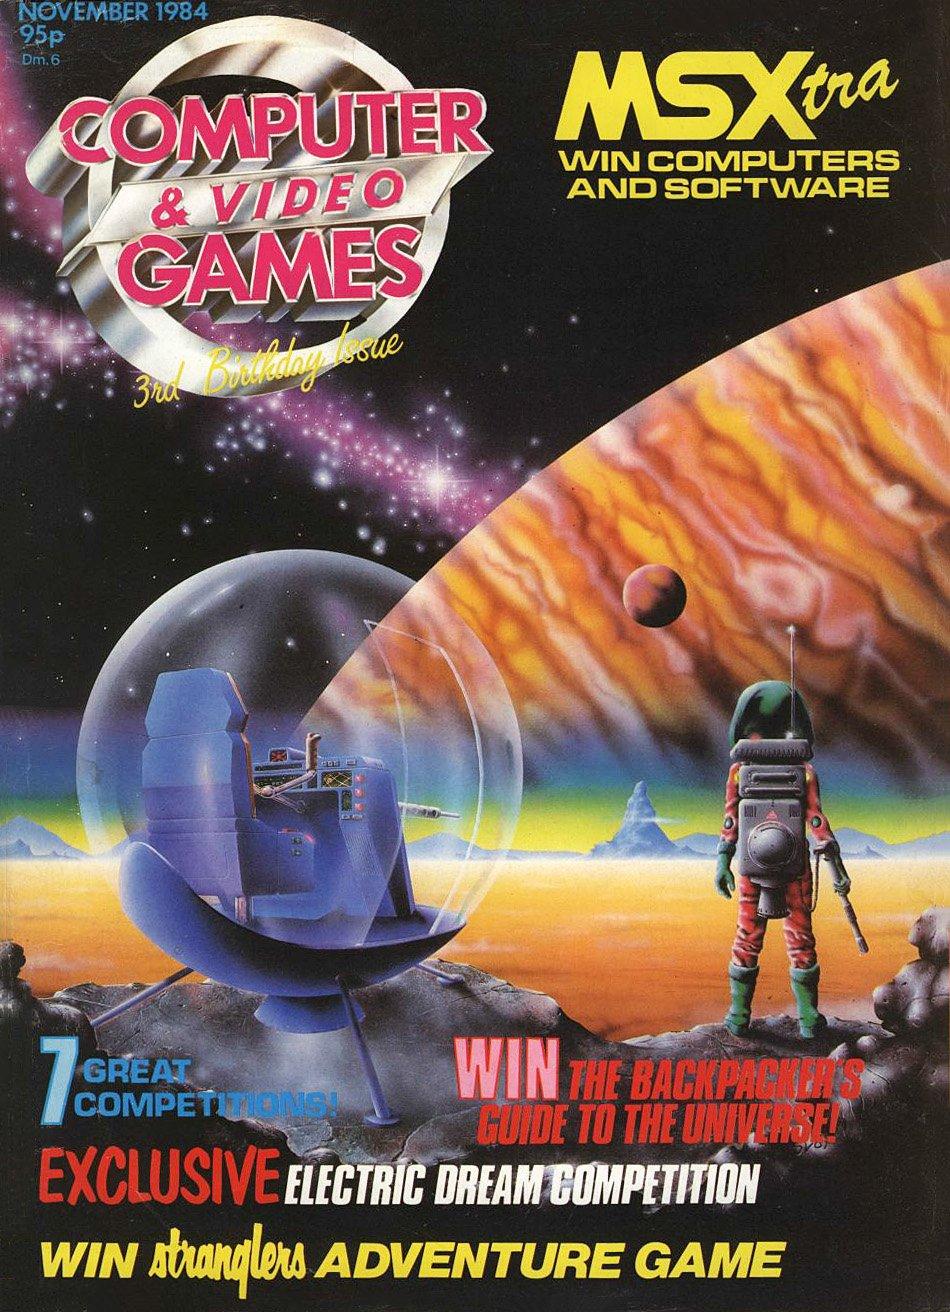 Computer & Video Games 037 (November 1984)